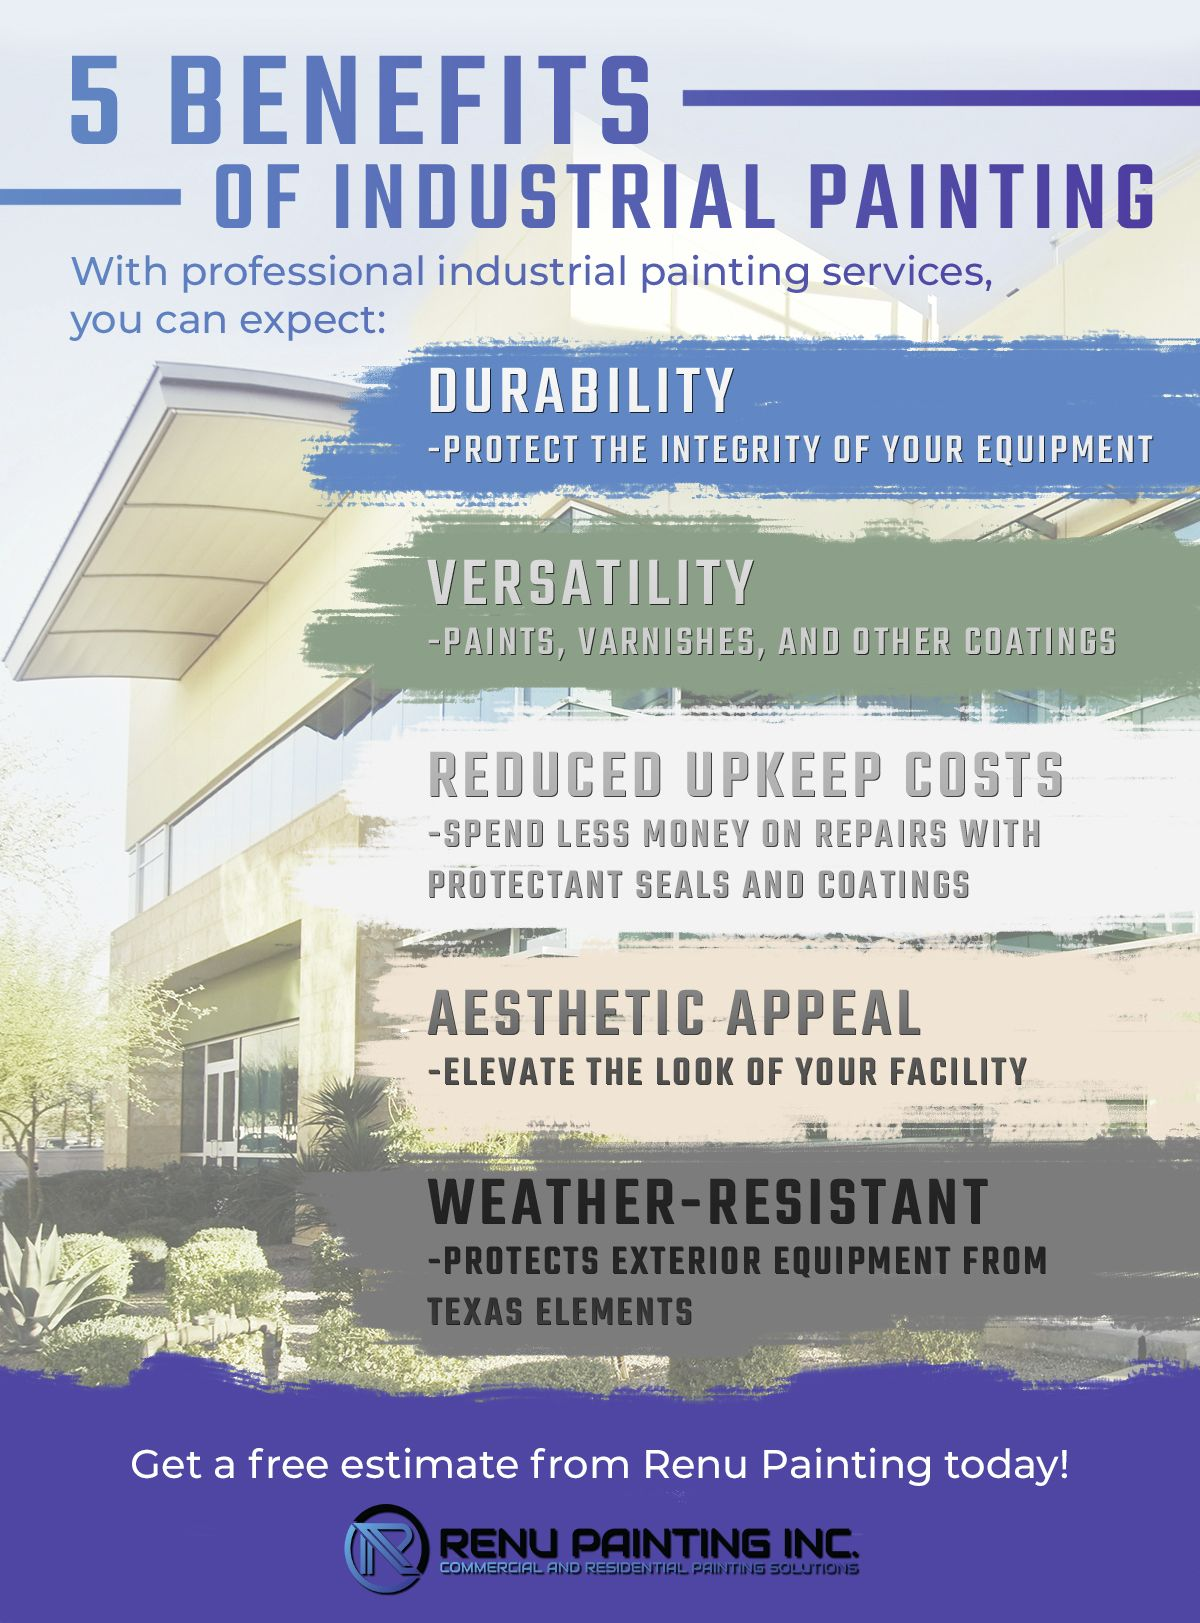 5-Benefits-Of-Industrial-Painting-603d22ff97b47.jpg